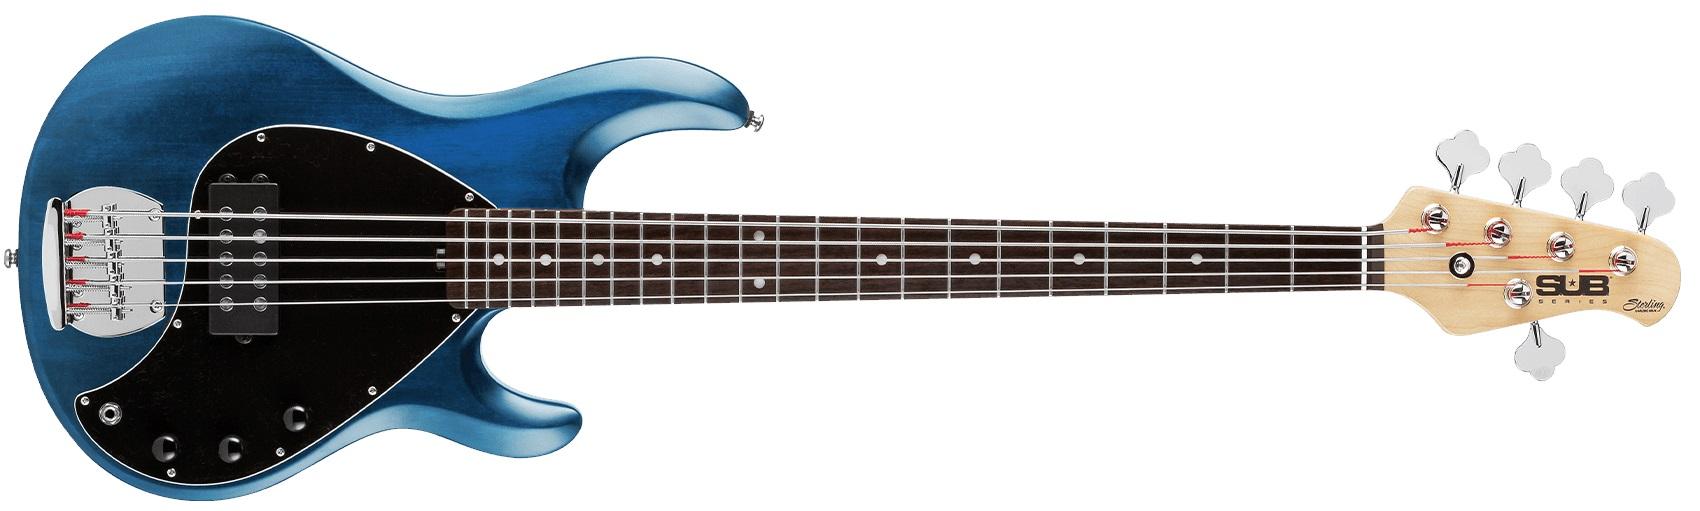 Sterling by Music Man SUB StingRay5 Trans Blue Satin